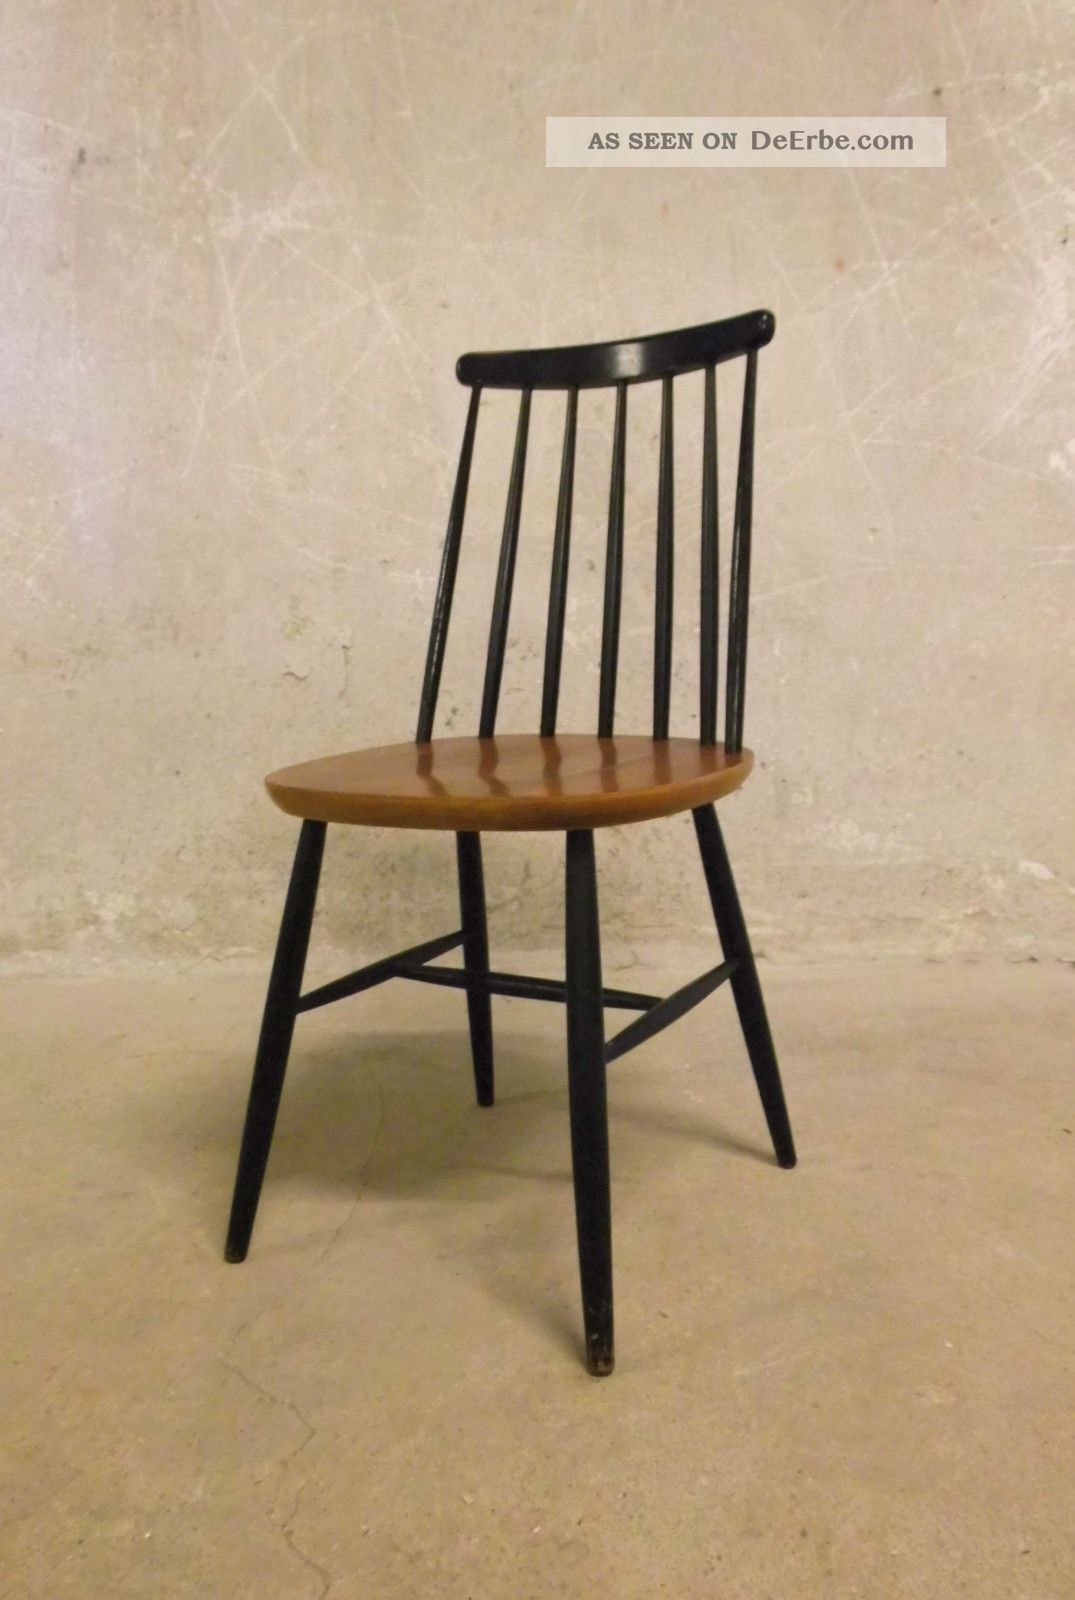 Stuhl chair fanett stil asko tapiovaara era mid century for Stuhl design epochen